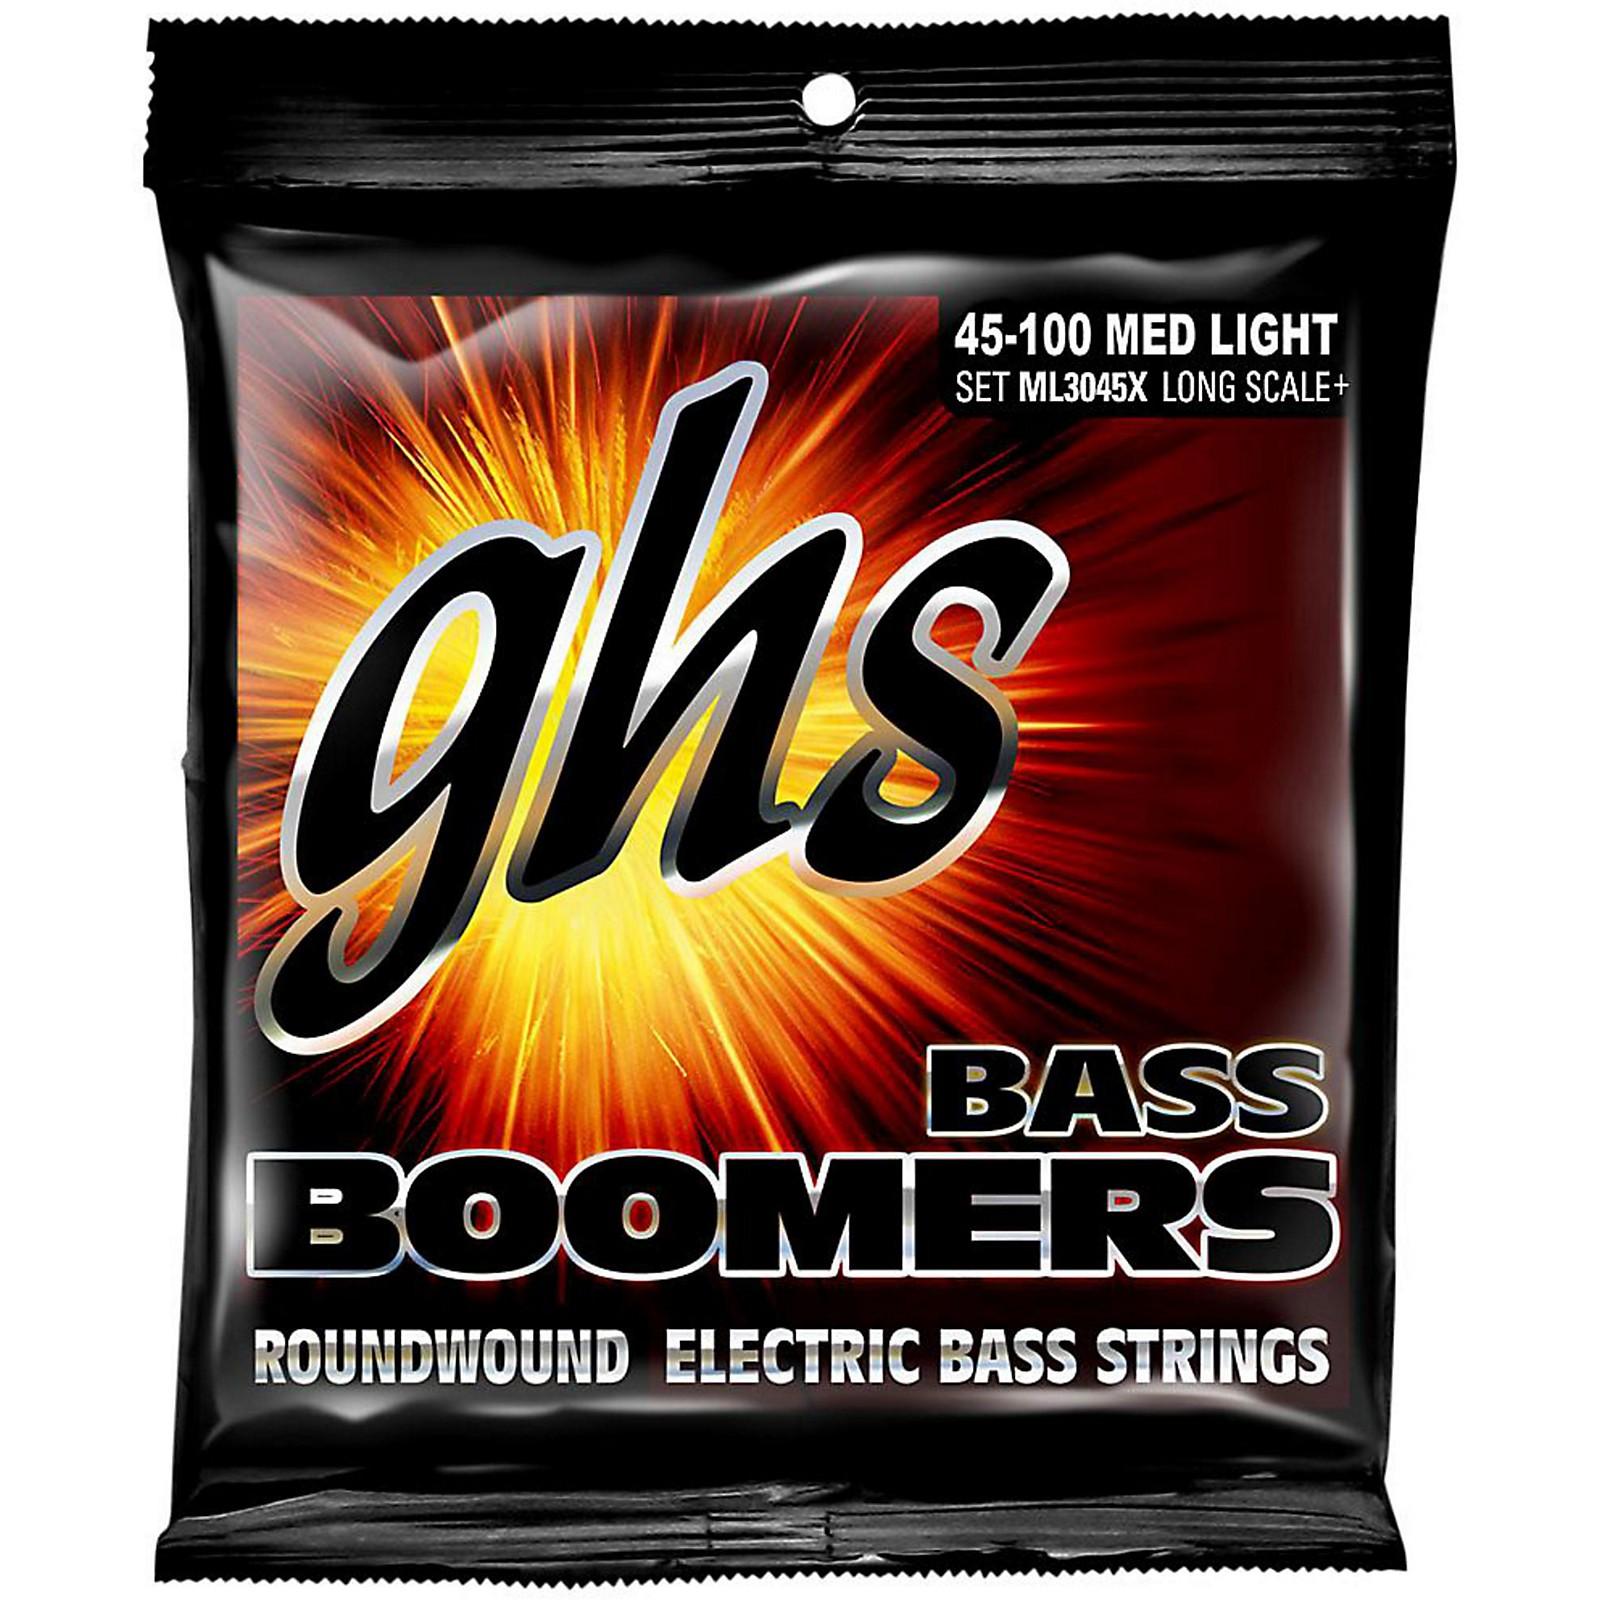 GHS Boomers Long Scale Plus Medium Light Bass Guitar Strings